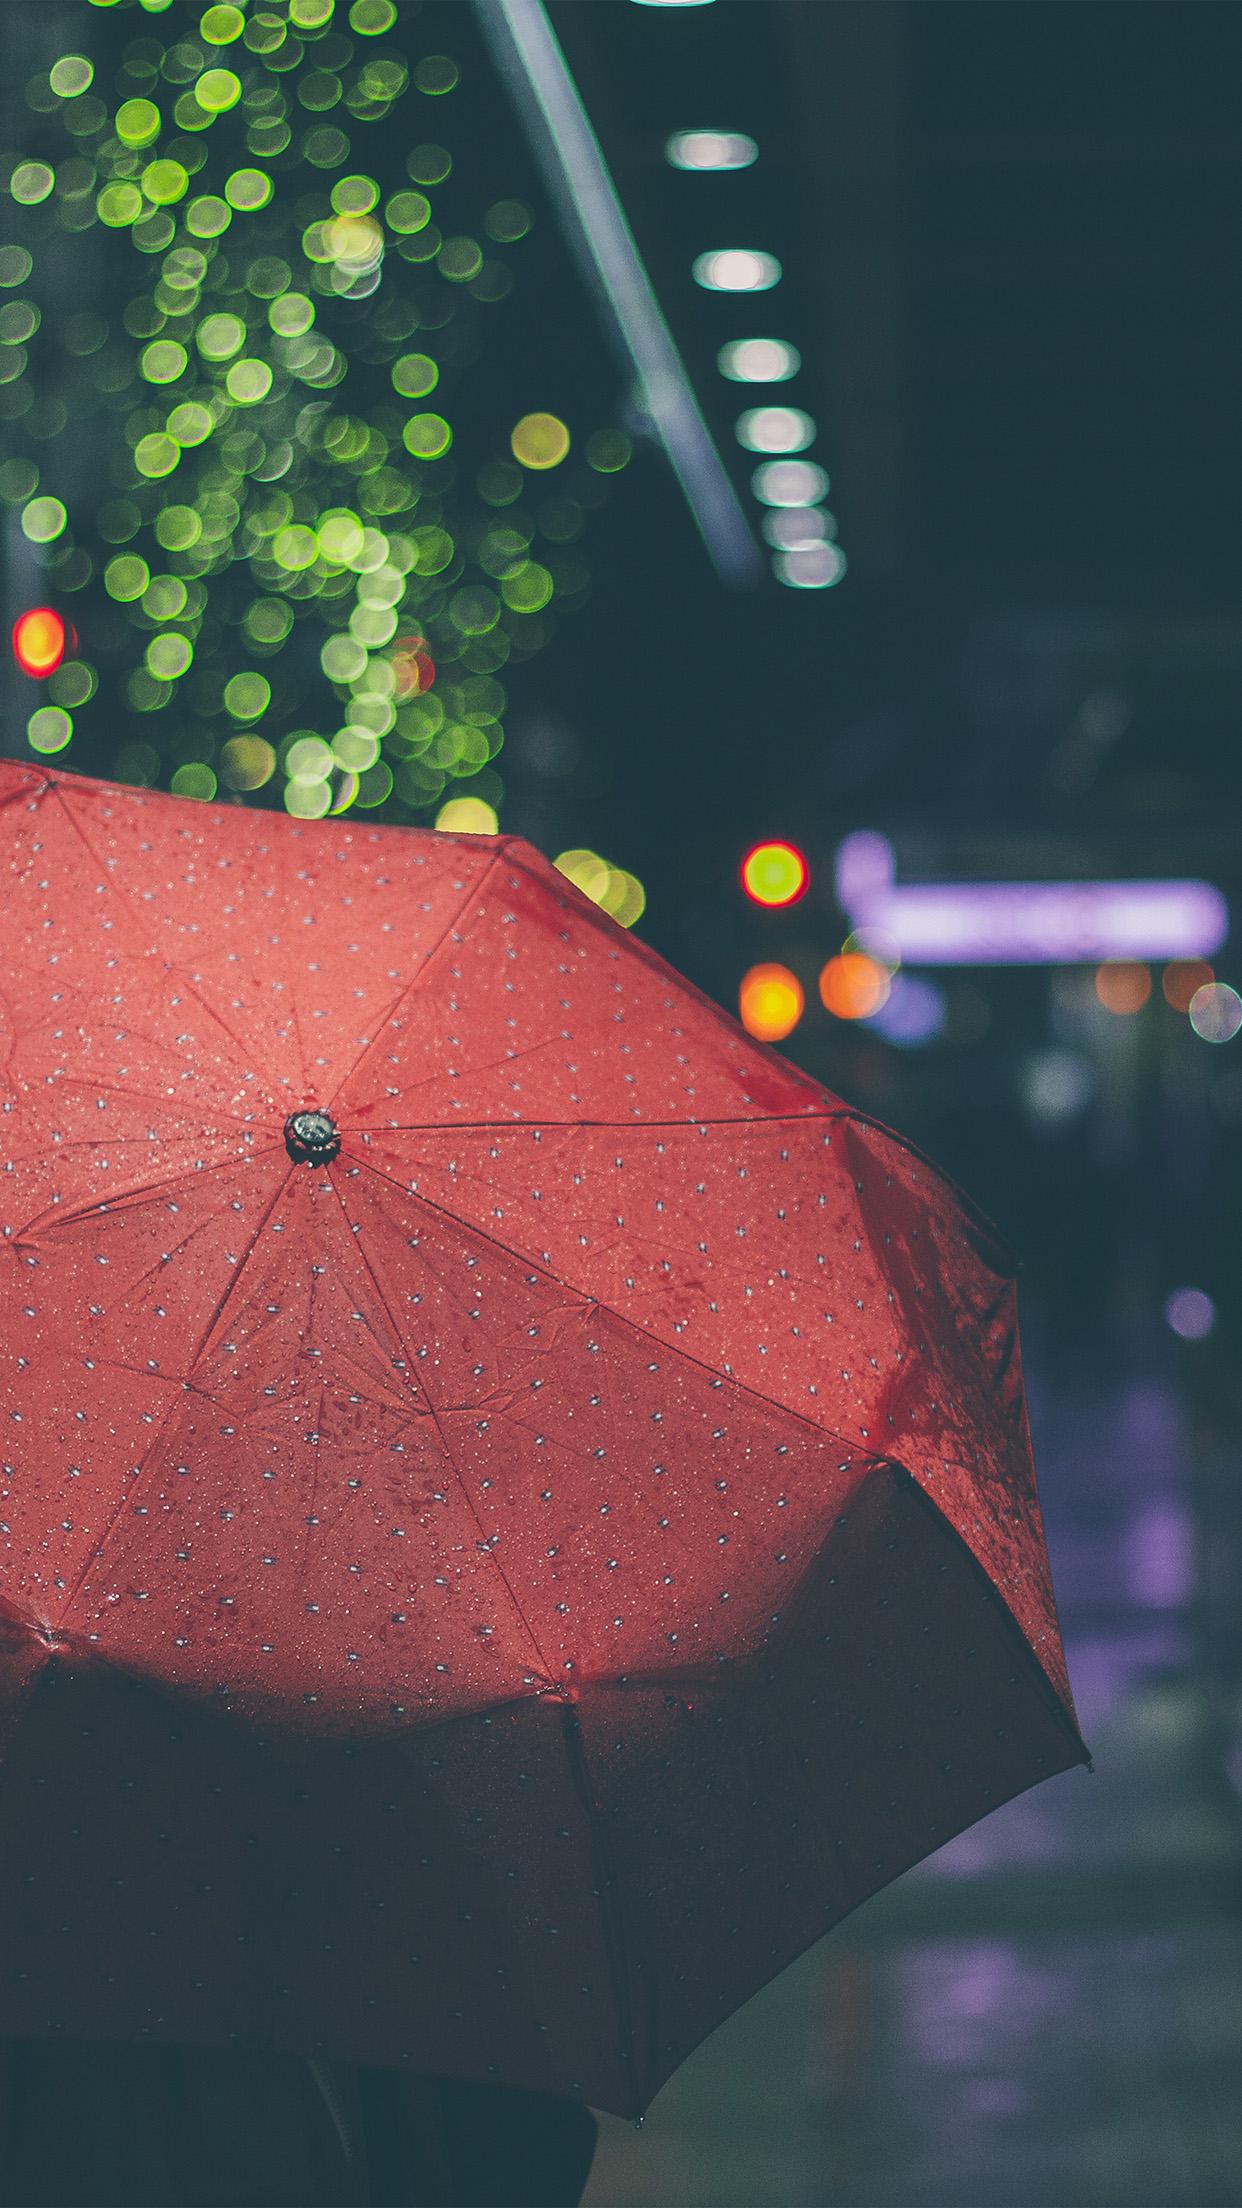 rainyday umbrella bokeh city night dark android wallpaper android hd wallpapers